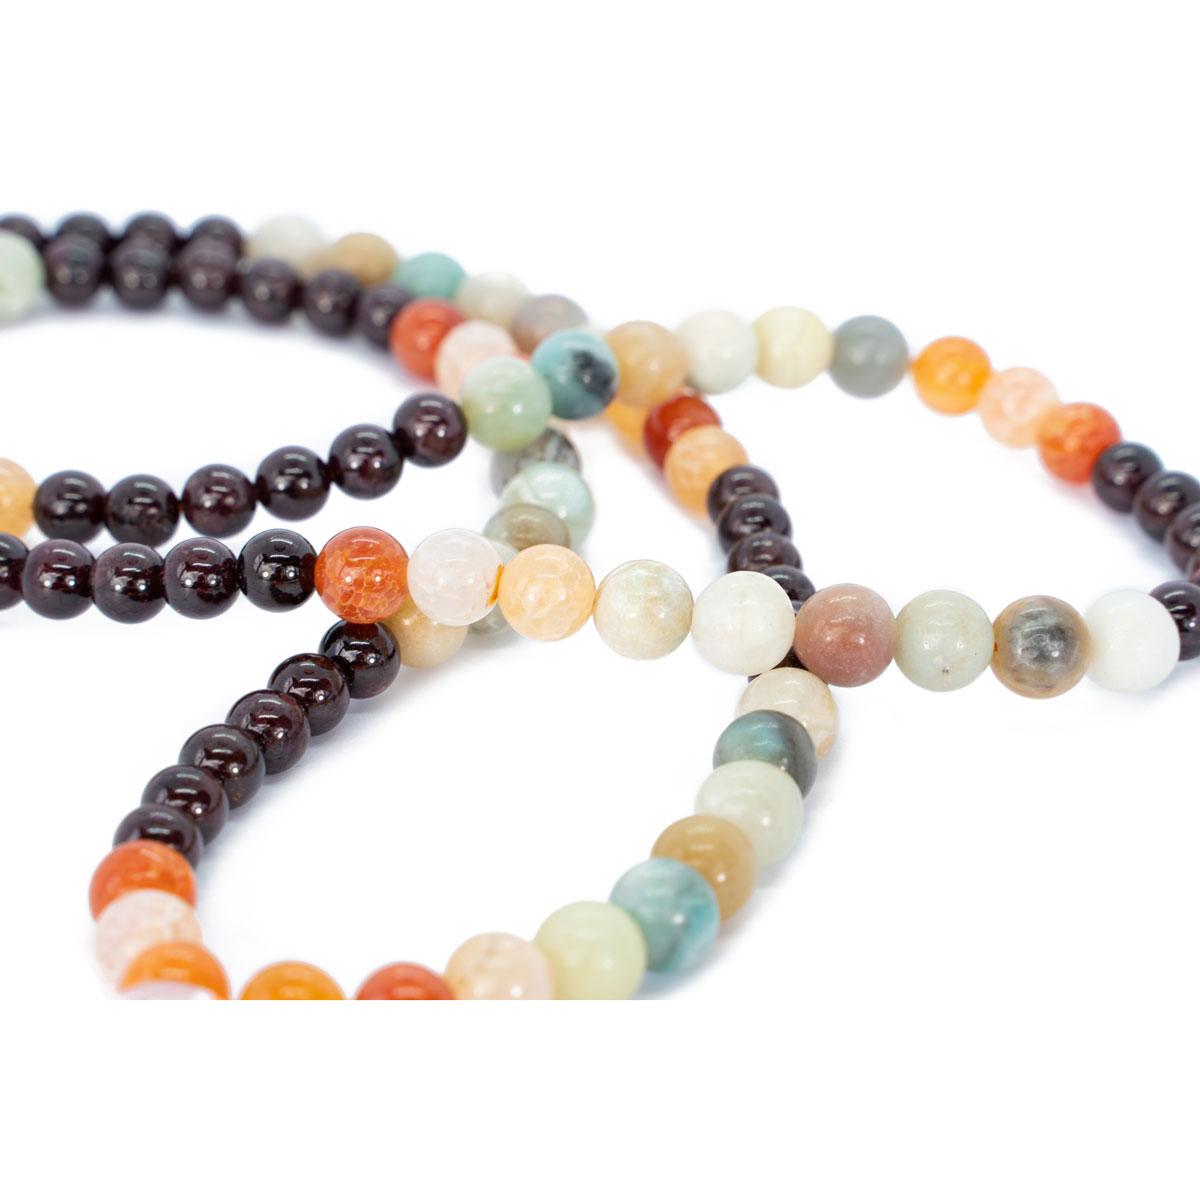 Sri Avinash Blessed™ Garnet, Onyx & Amazonite Mala Necklace